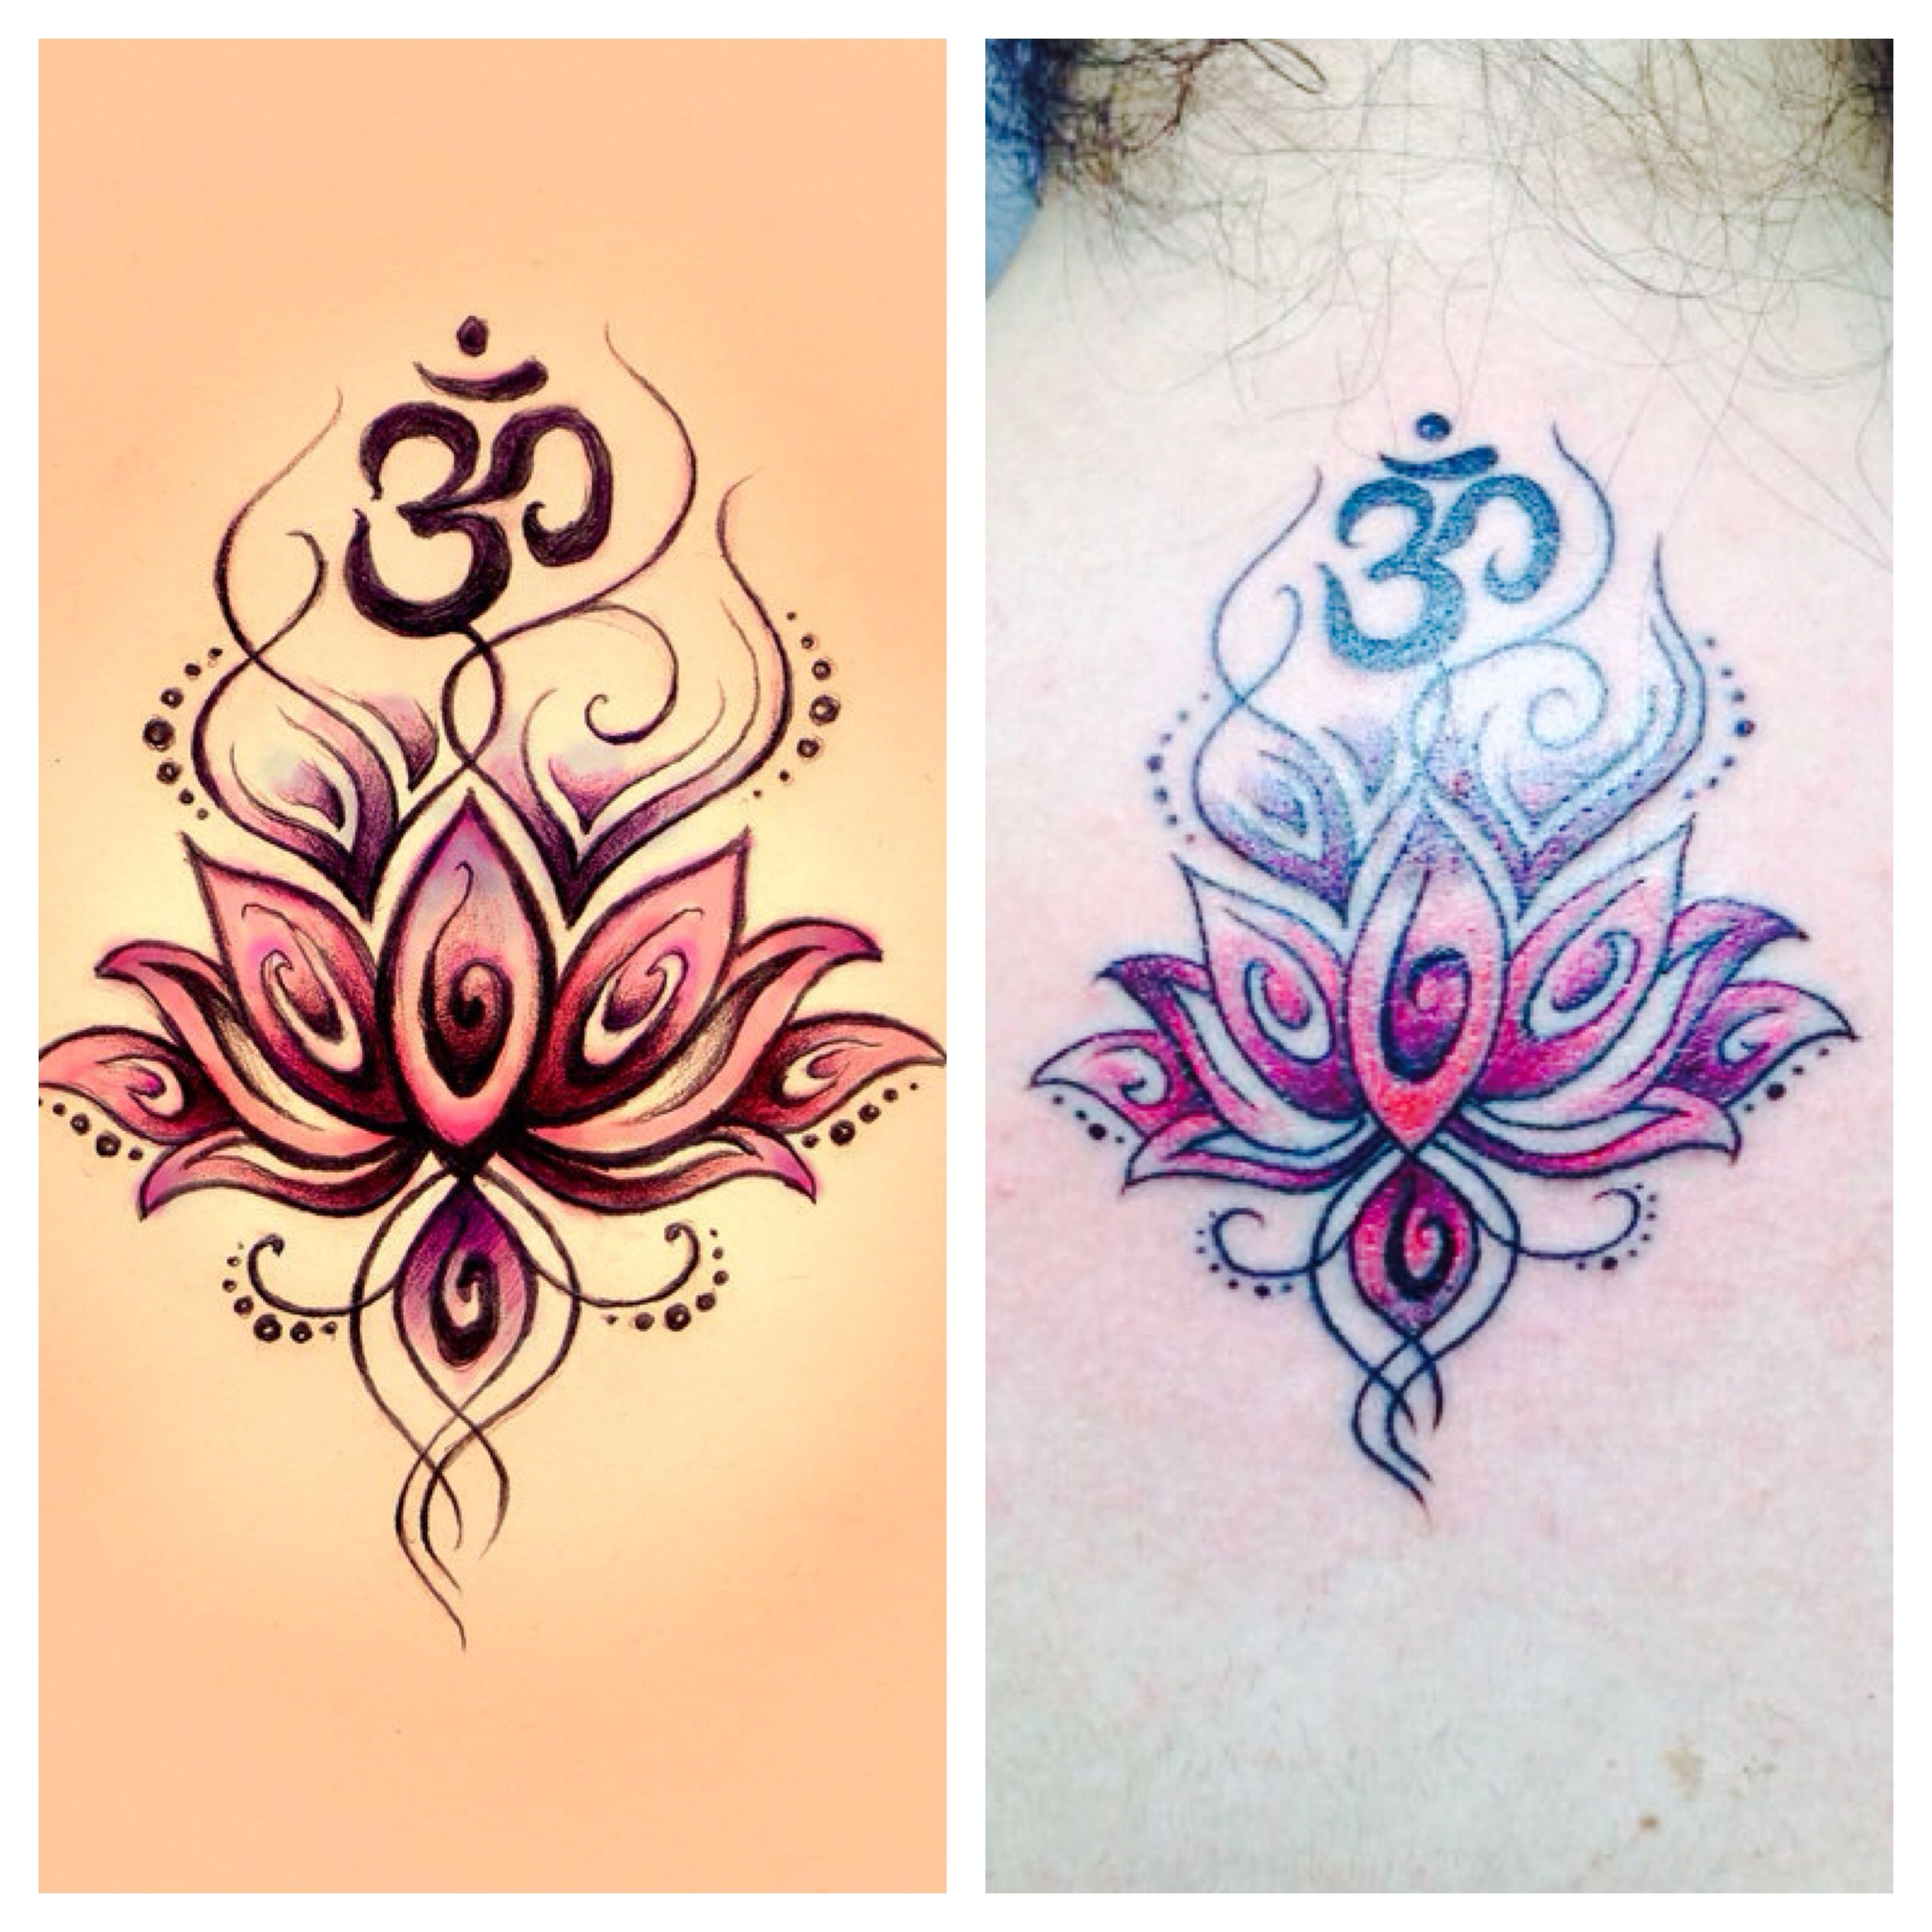 Lotus Flower Henna Tattoo Designs: My Om/lotus Flower Tattoo #tattoo #omtattoo